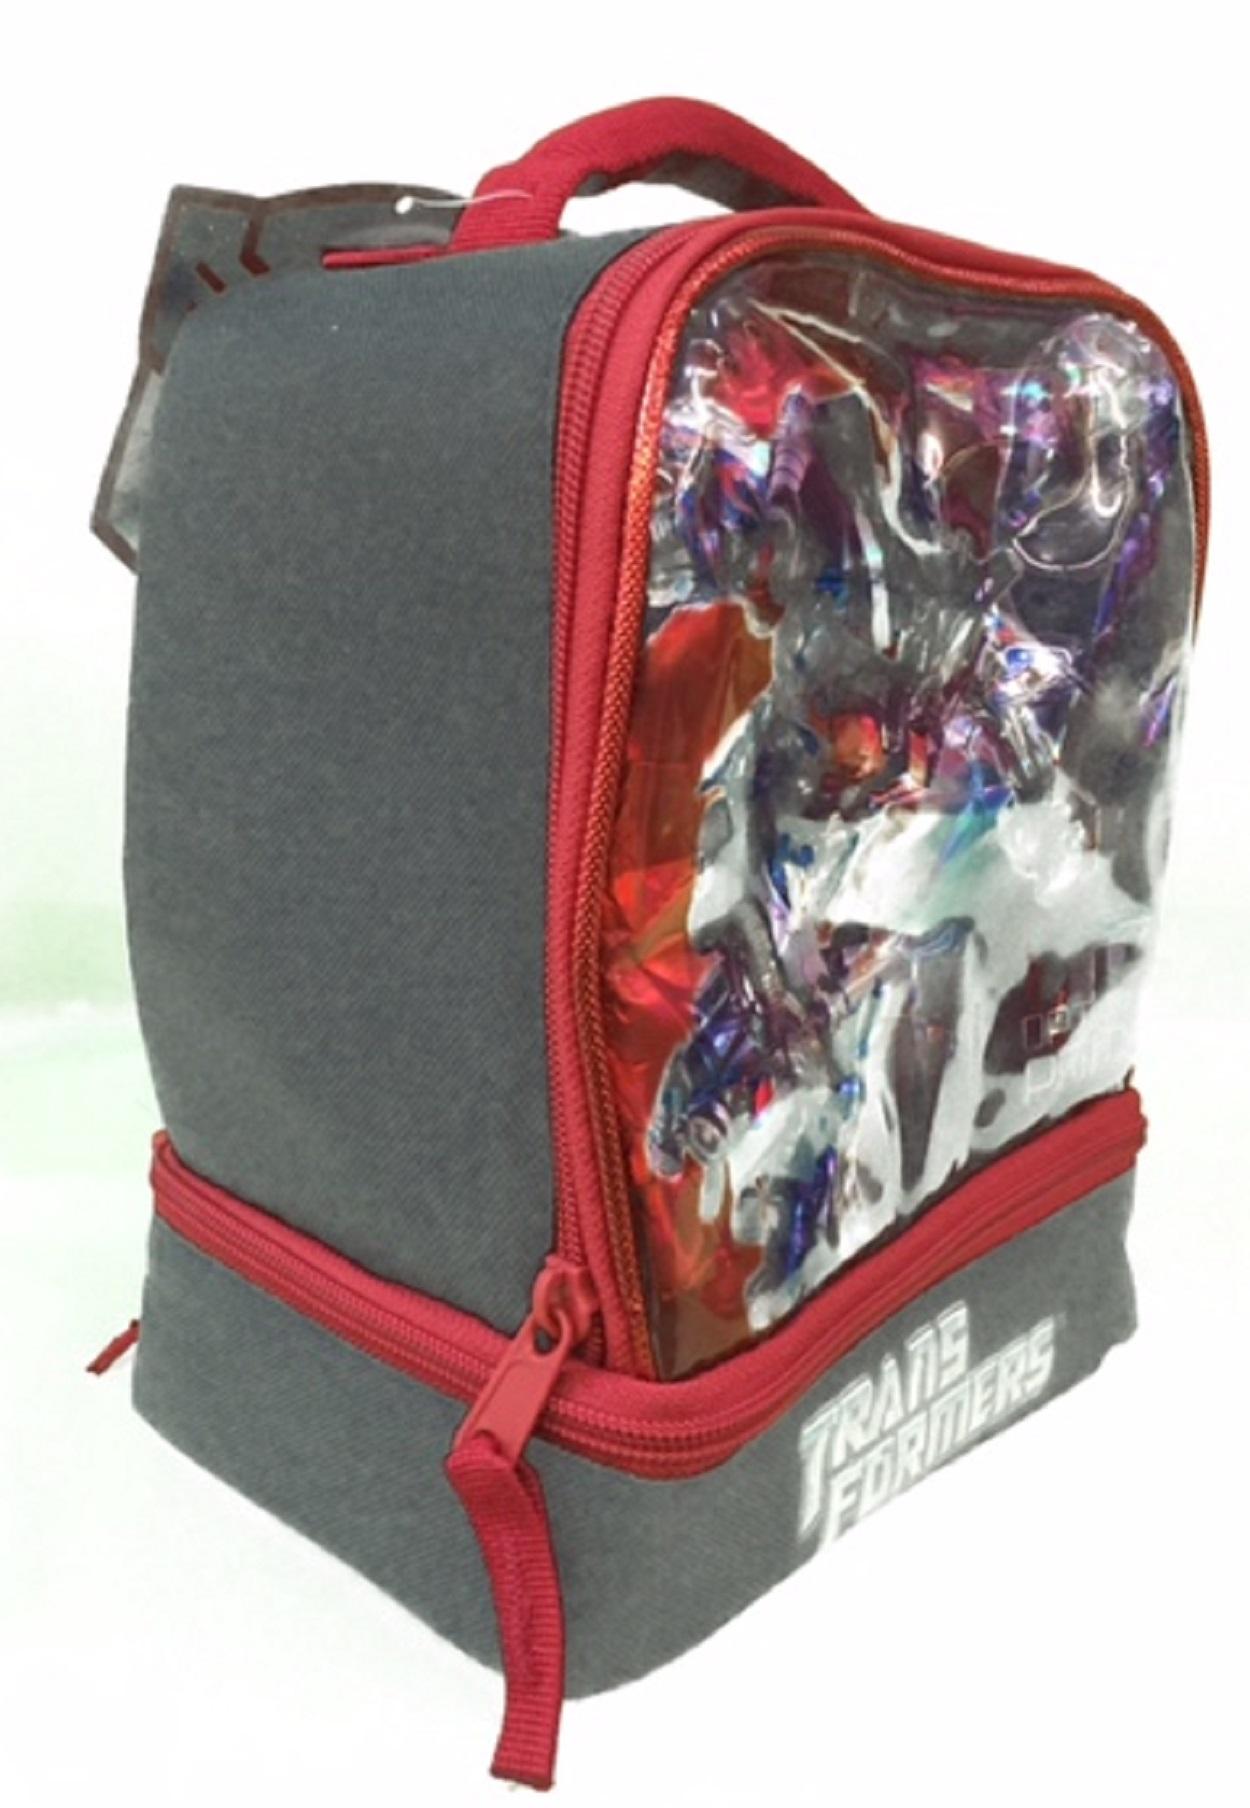 3824cd495ed8 Lunch Box - Transformers - Optimus Prime